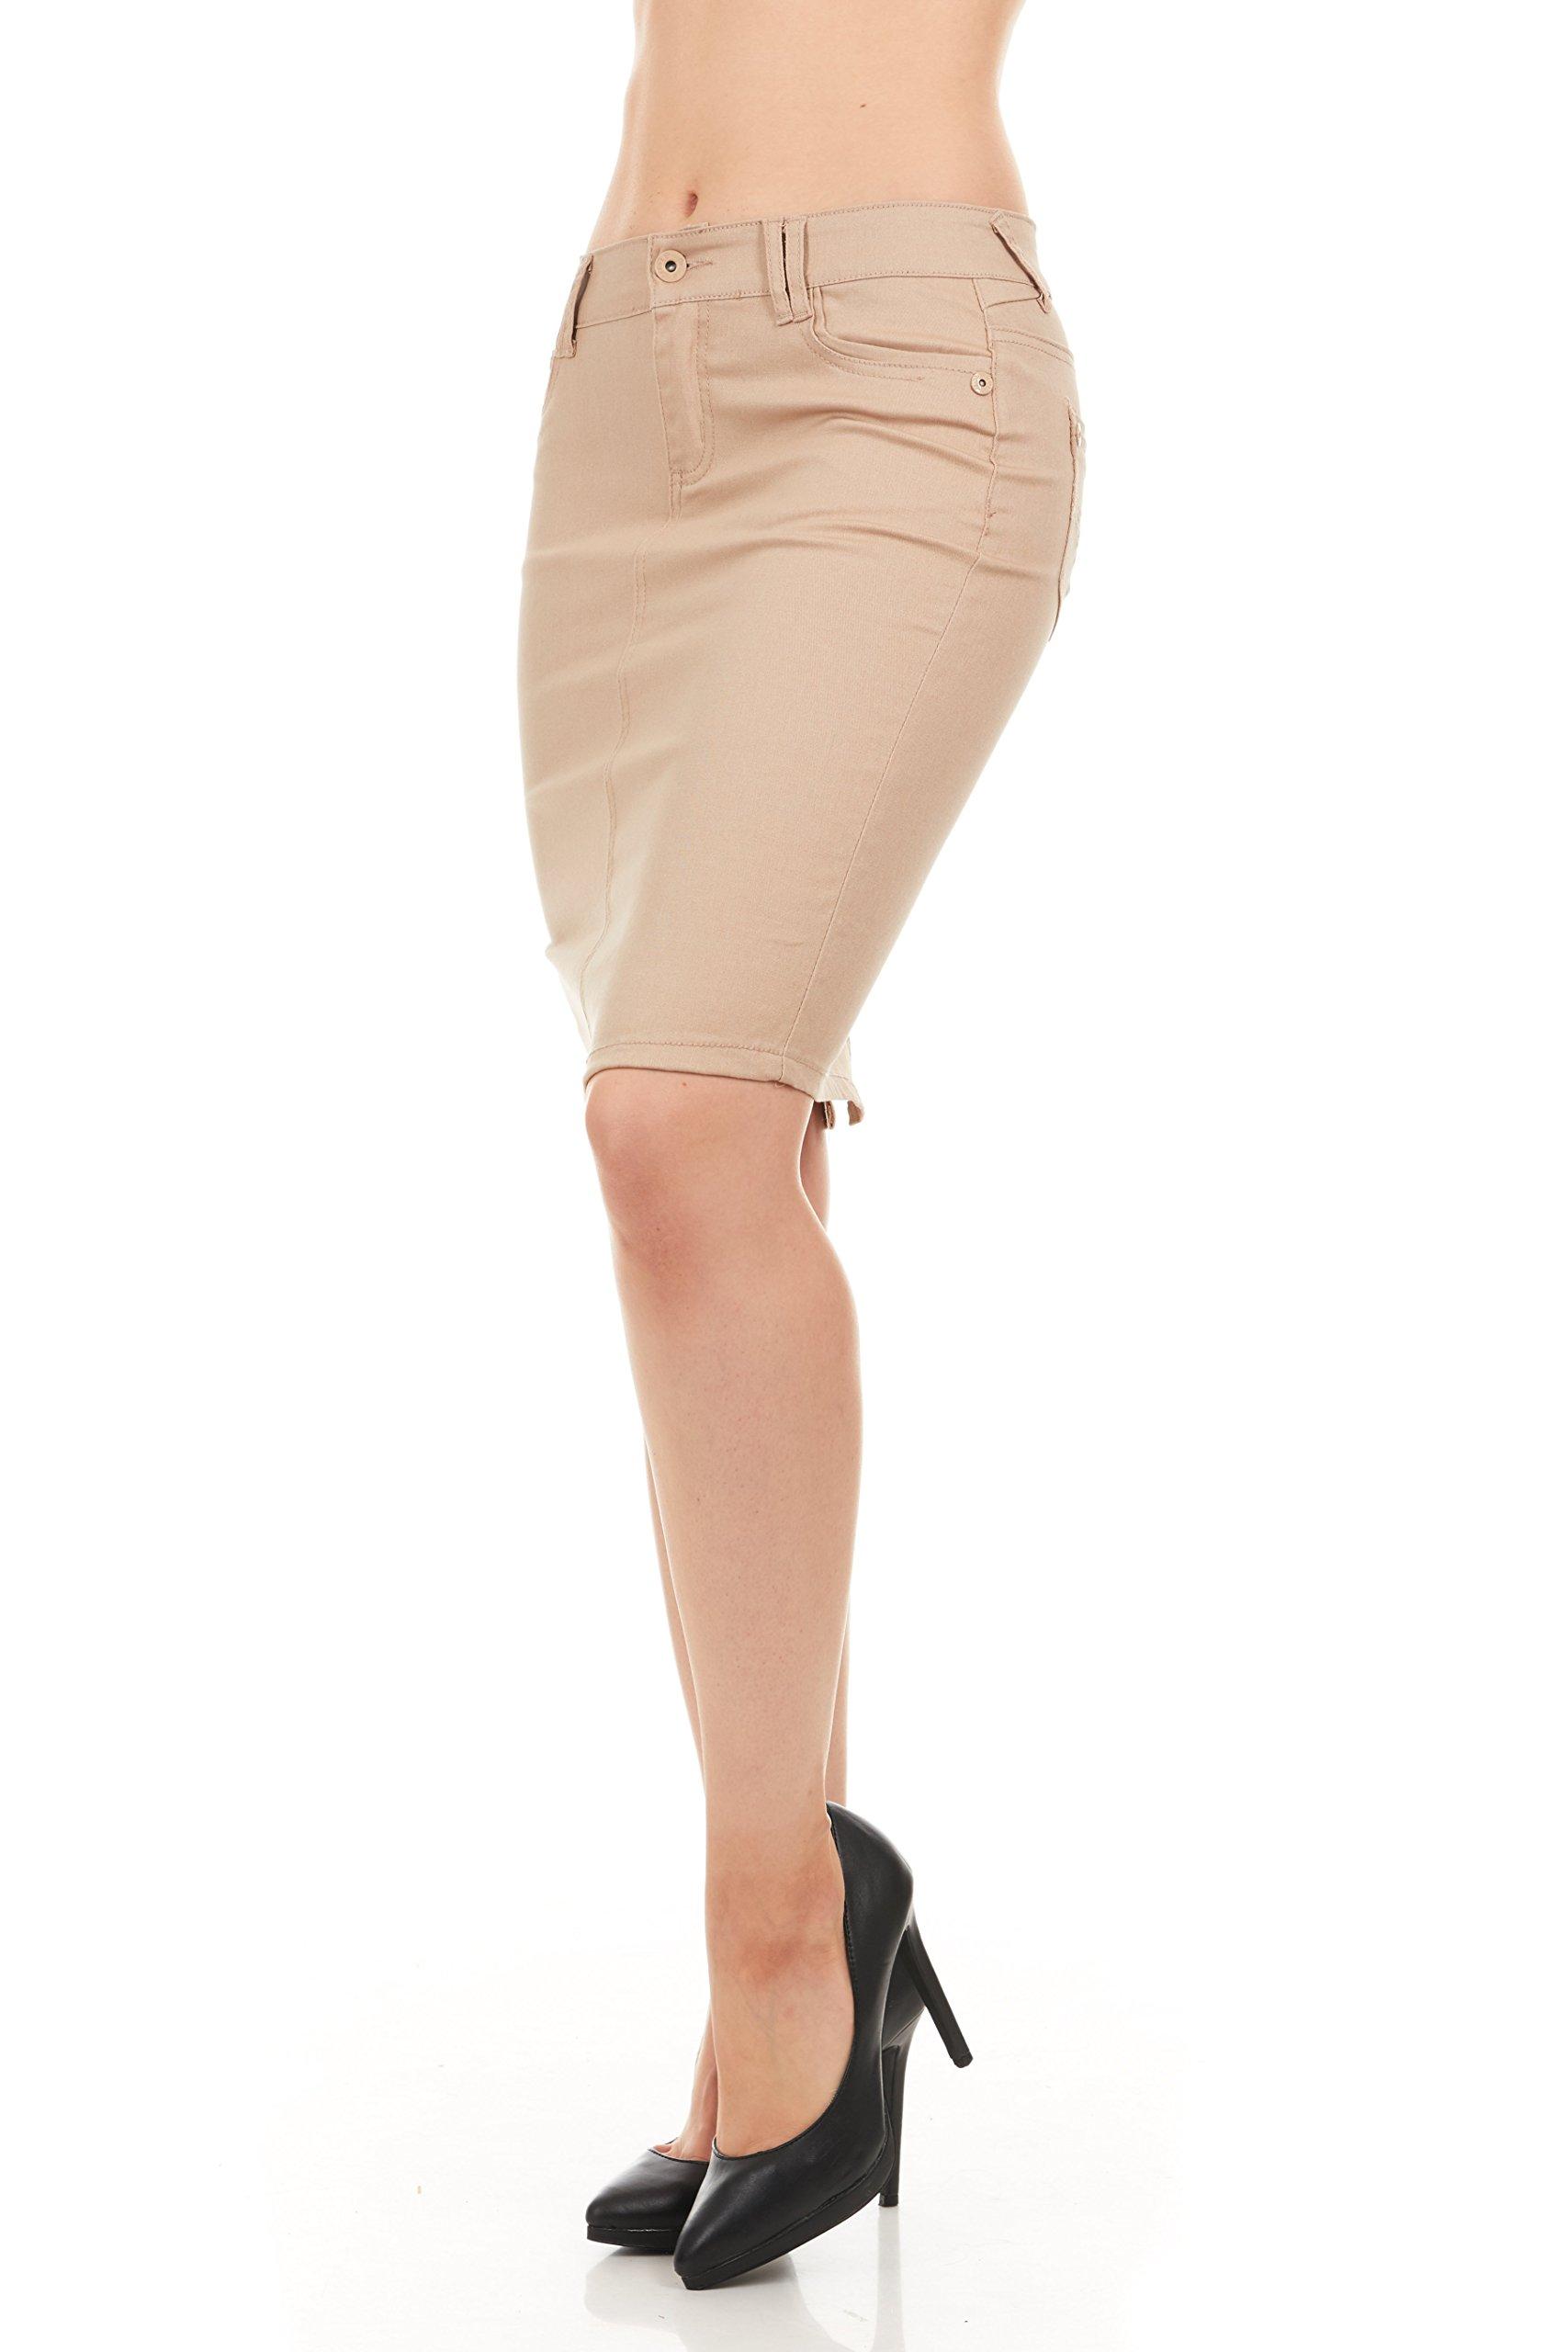 FGR Girl's Stertchy Cotton 5 Pocket Color Denim Skirt Khaki Size 12 by FGR (Image #6)